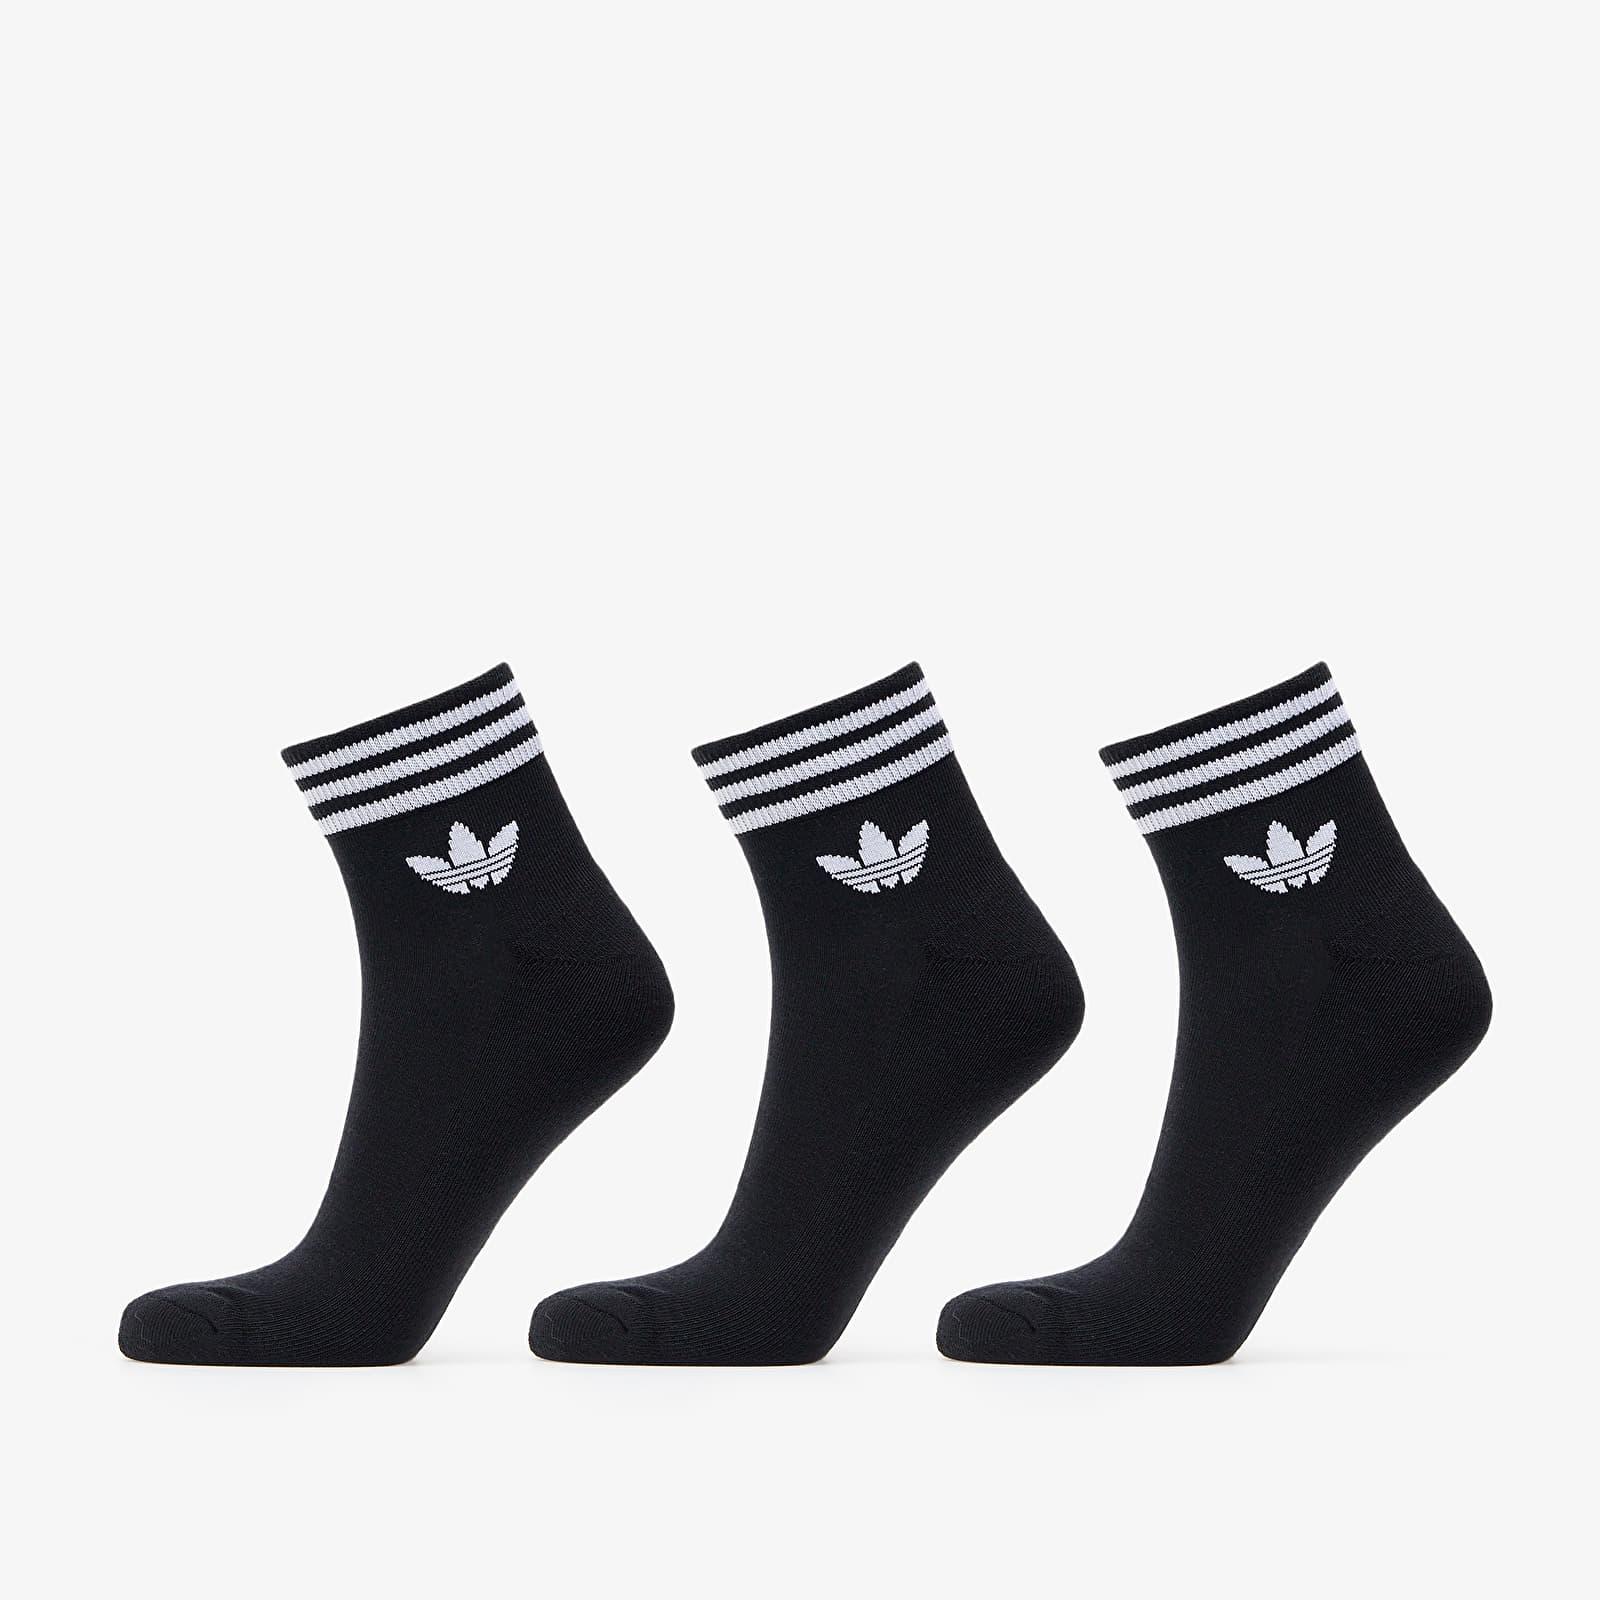 adidas Originals Trefoil Ankle Socks (3 Pairs) Black/ White EUR 39-42